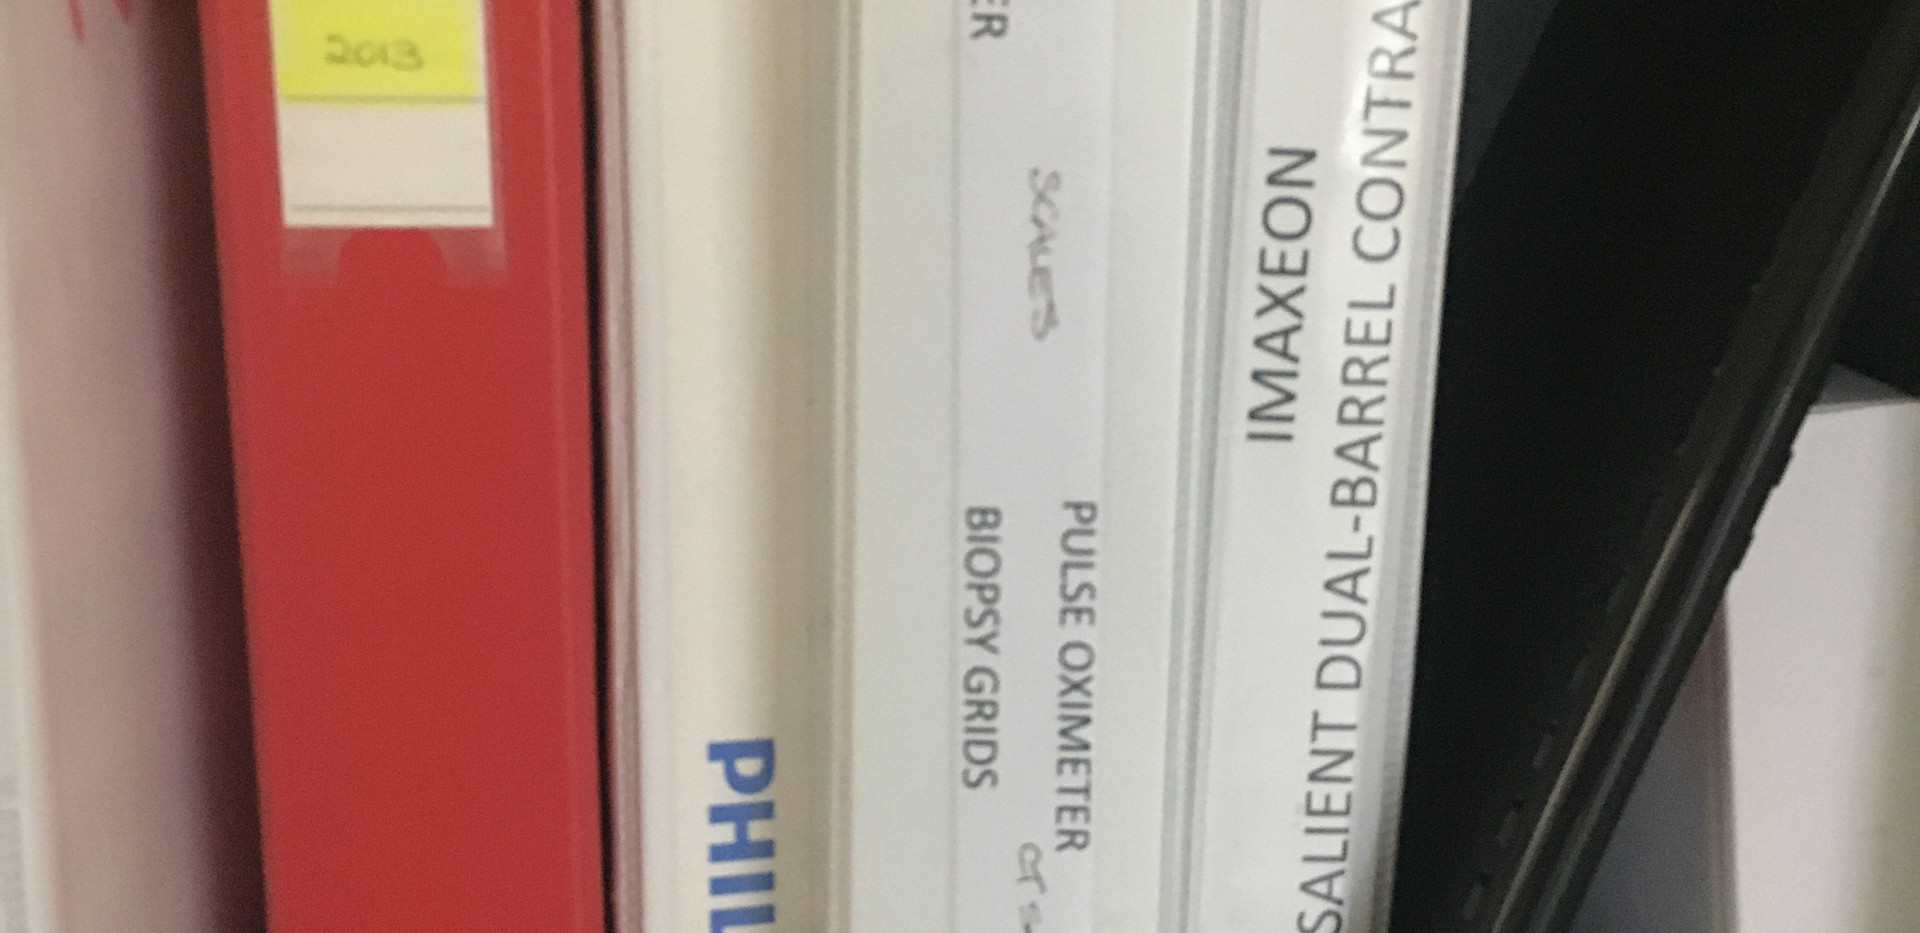 Philips Brilliance 16 slice (22).JPG